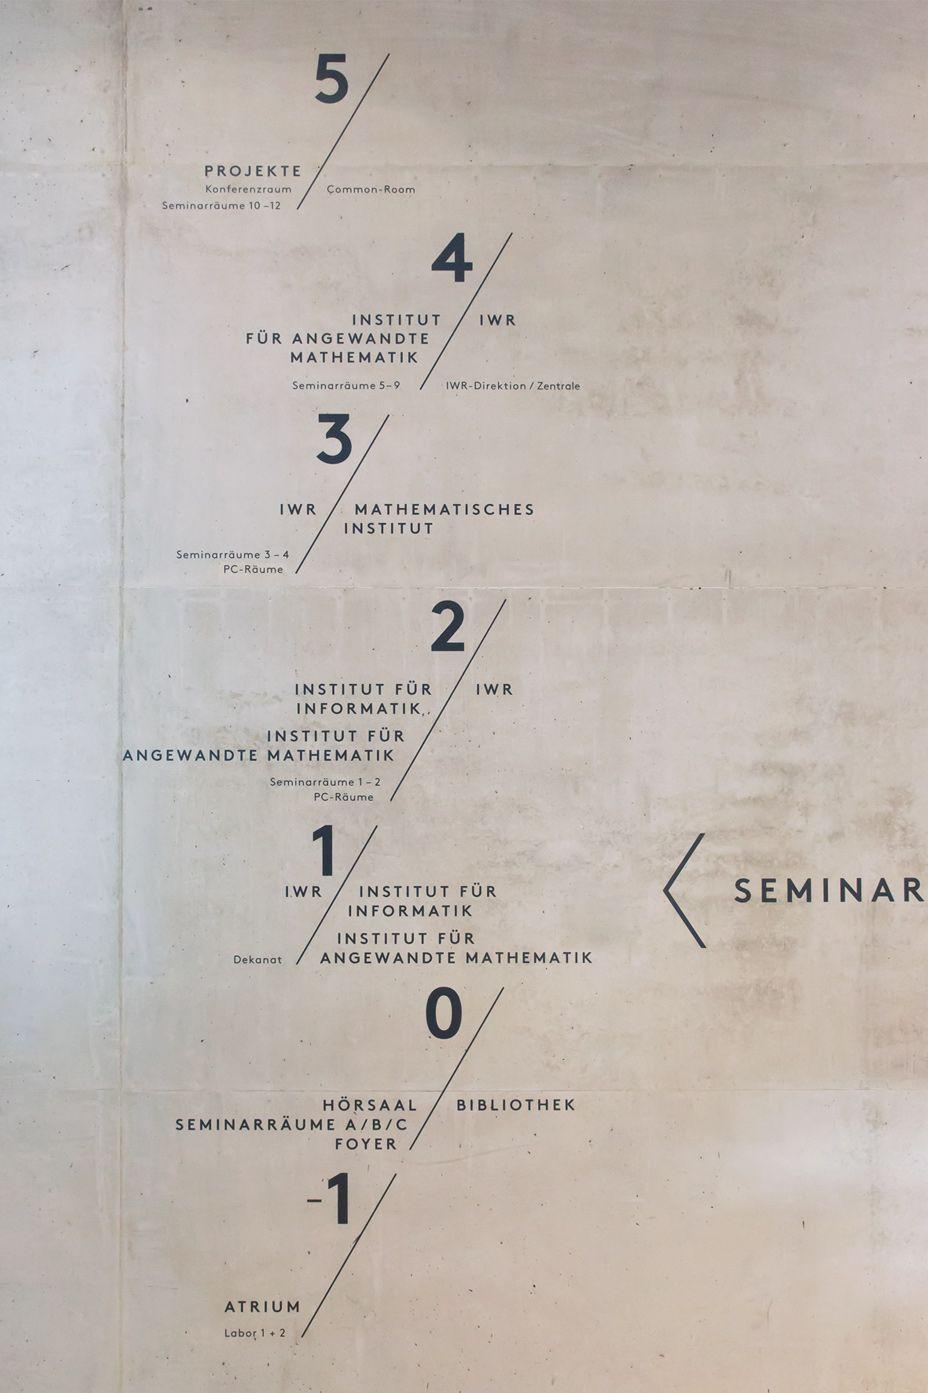 Badezimmerdesign 7 x 5 gentiana qovanaj qgentiana on pinterest